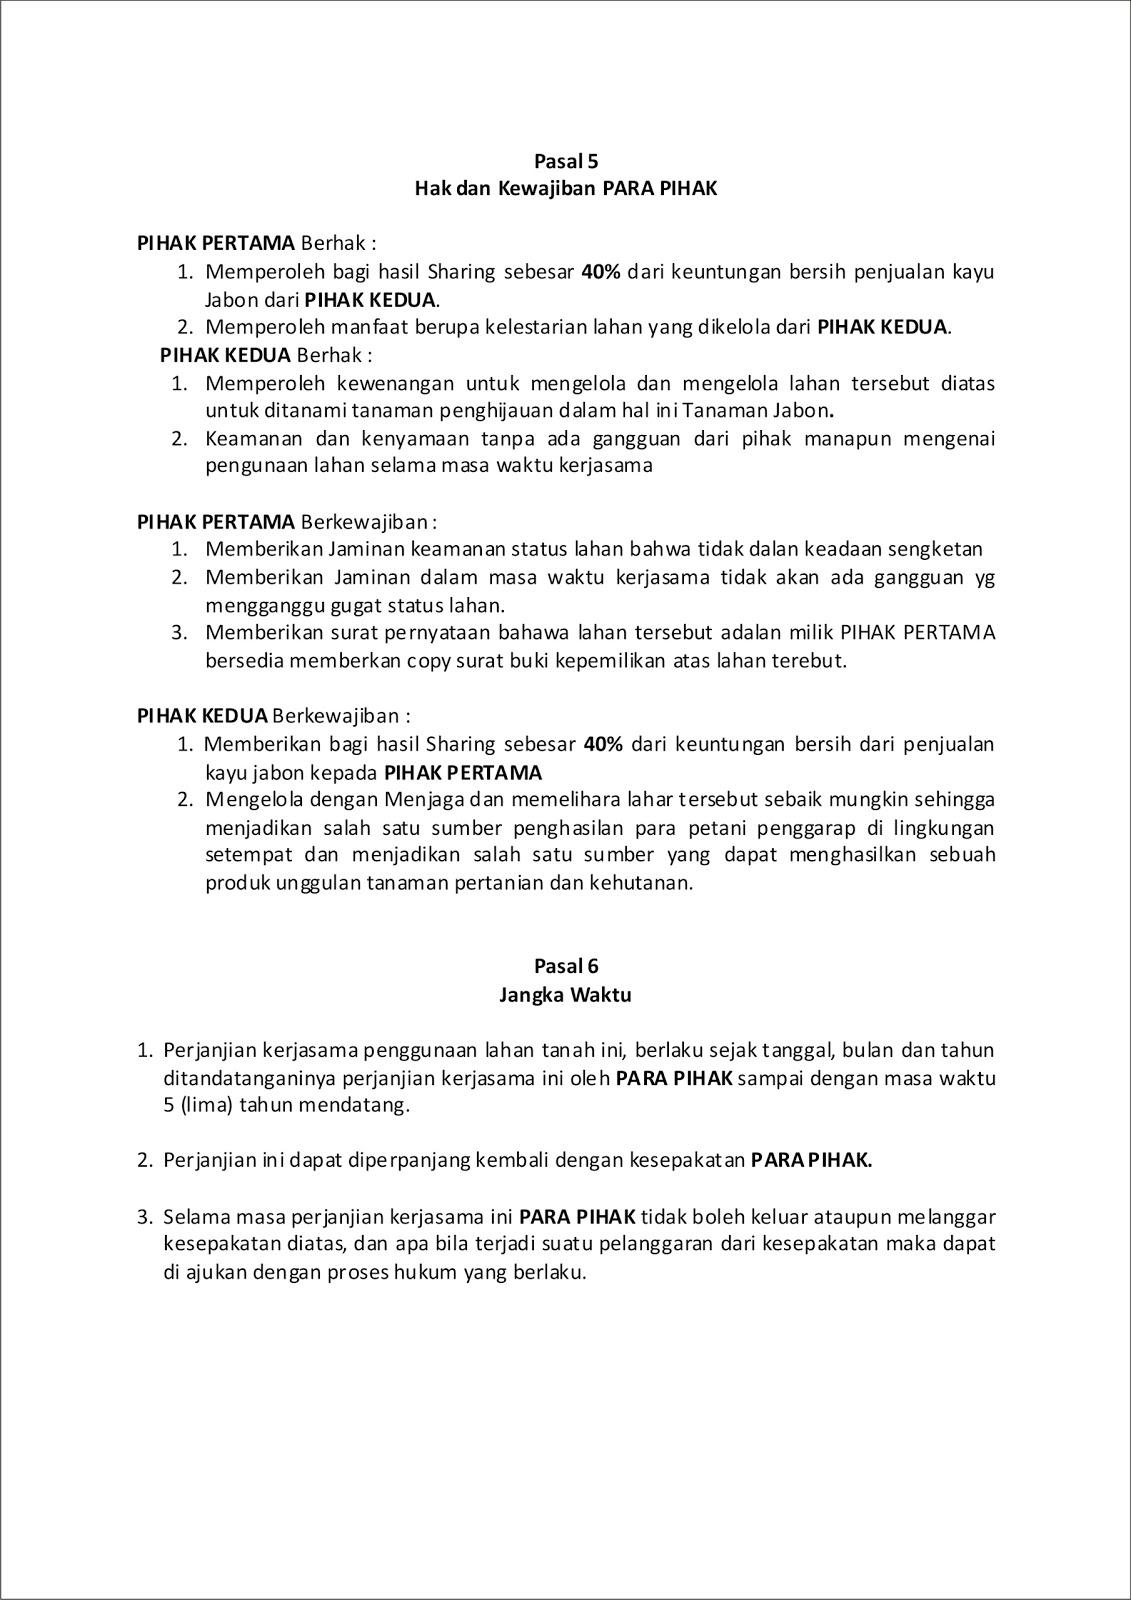 Contoh Surat Perjanjian Kerjasama Investasi Forex 3